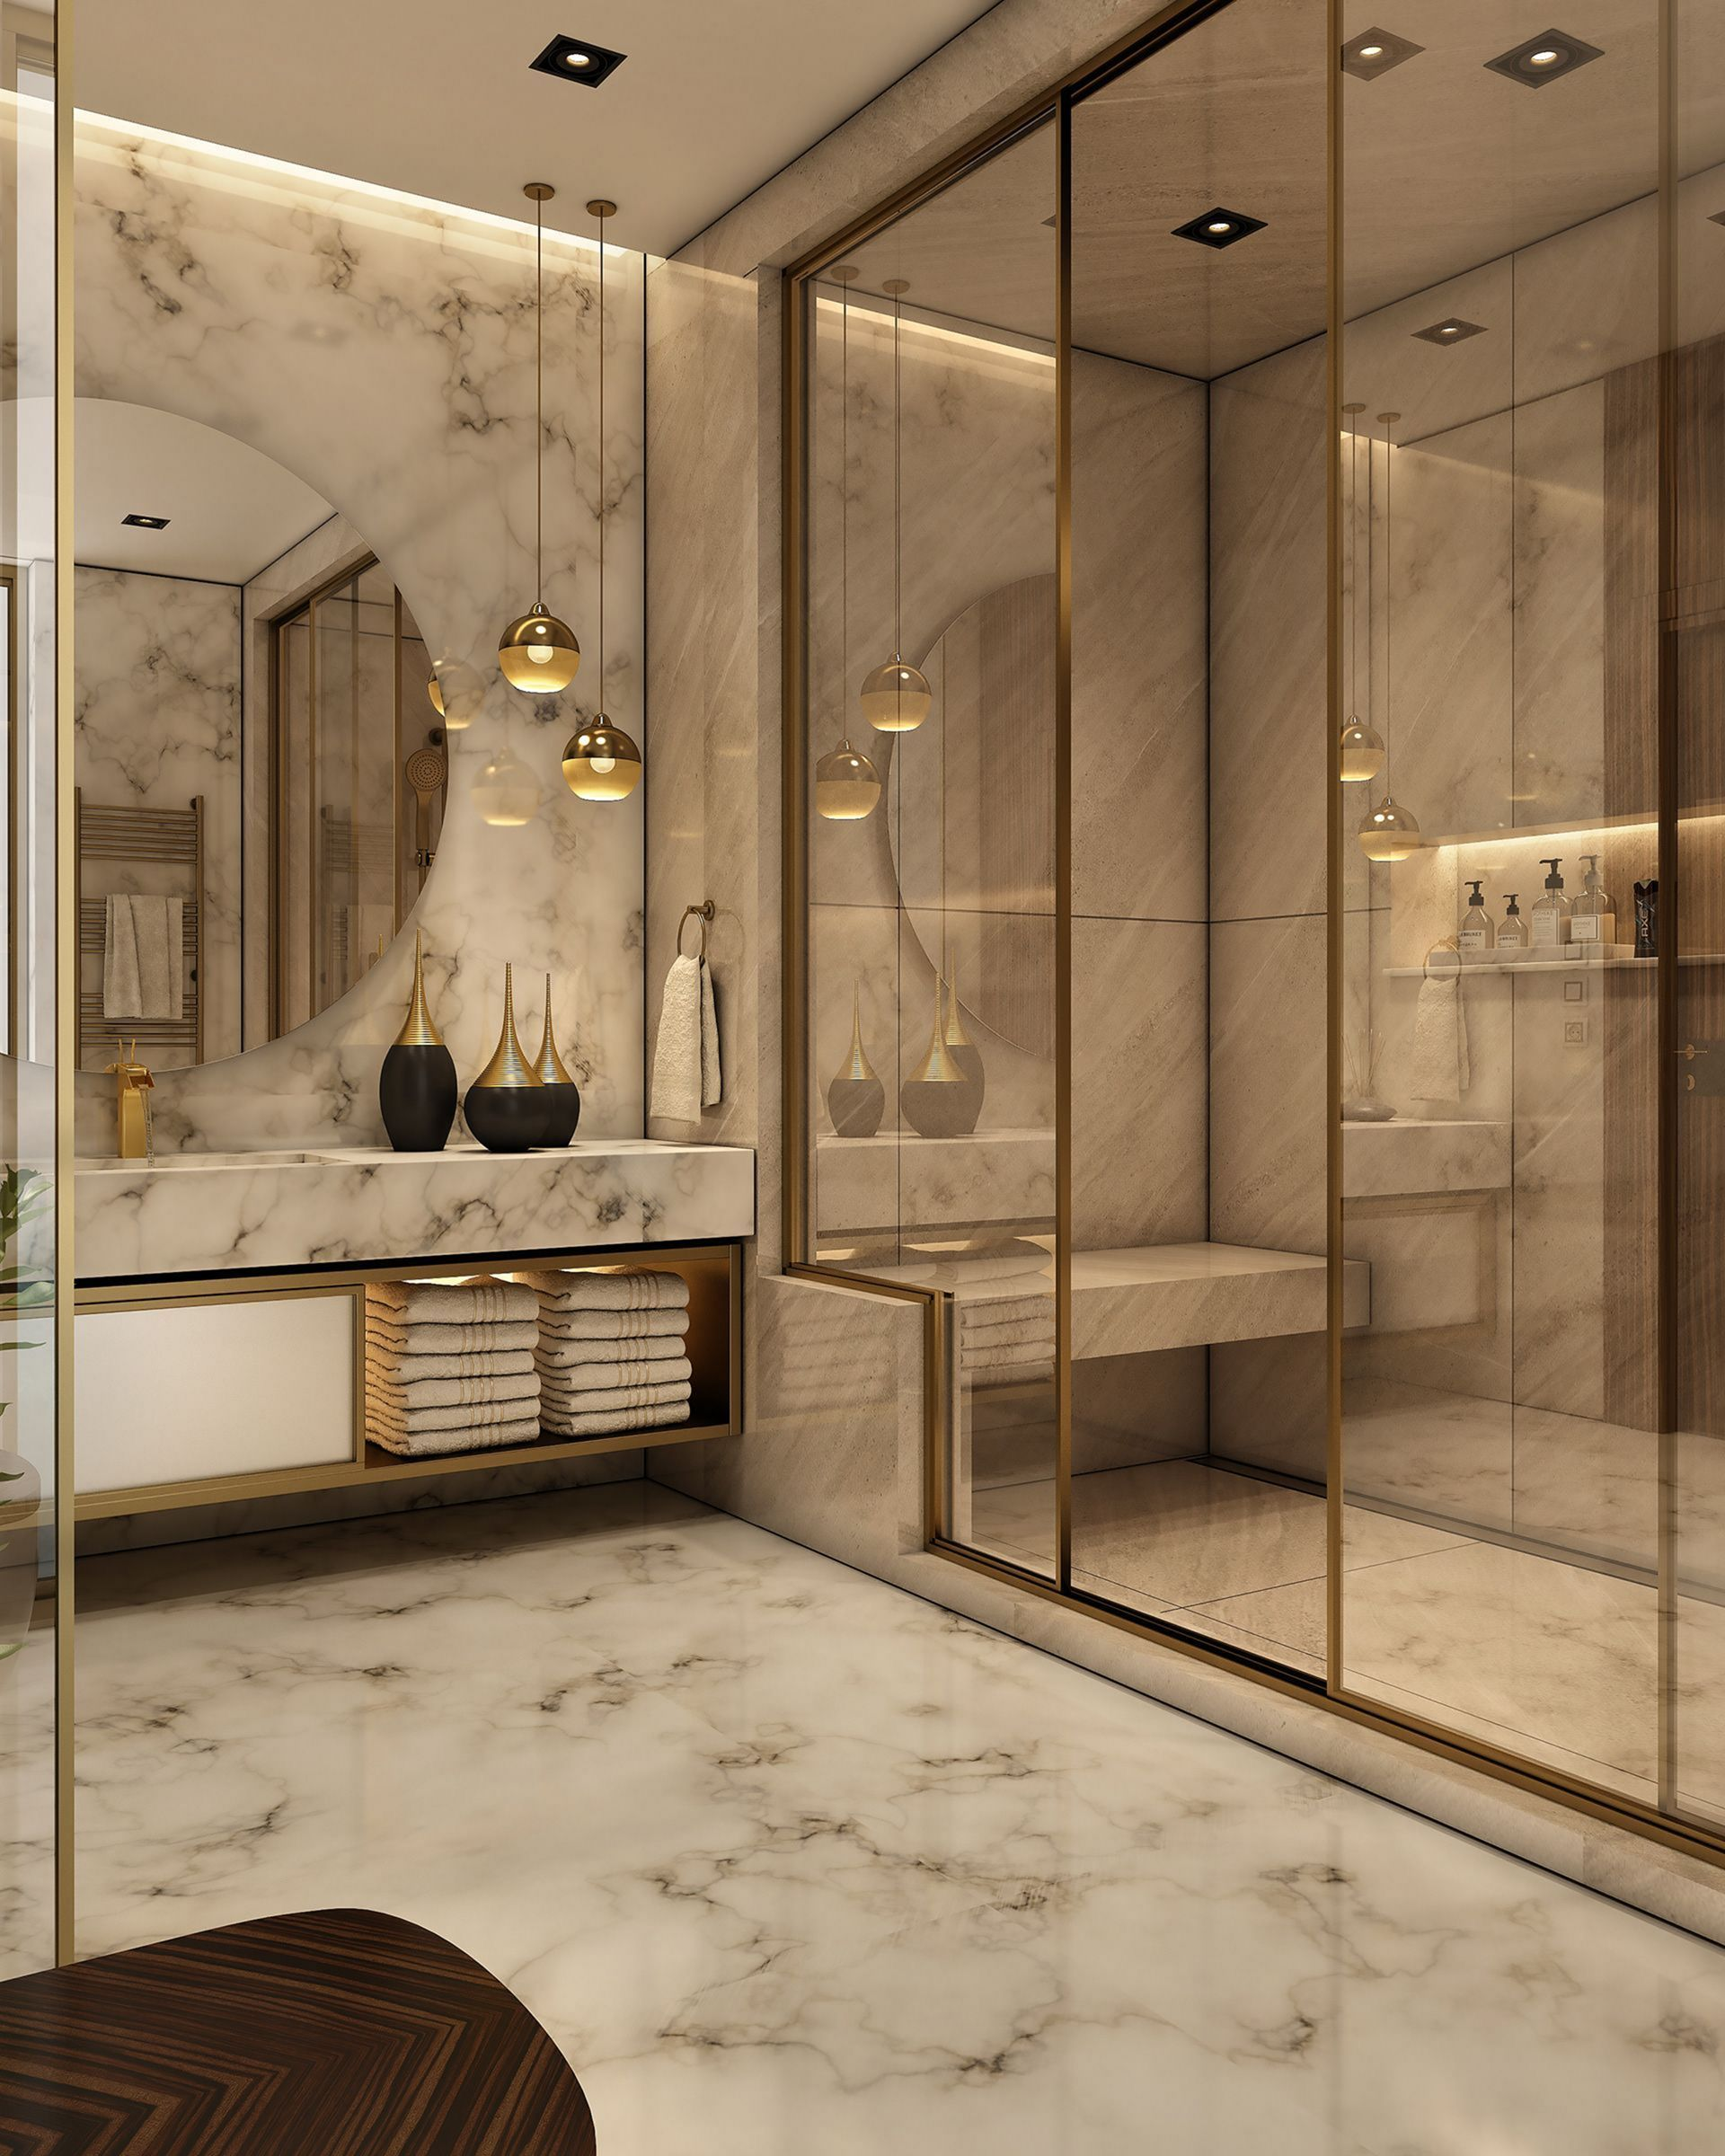 Enchanting Luxurious Bathroom Decorating Ideas 033 Innenarchitektur Badezimmer Design Luxurioses Badezimmer